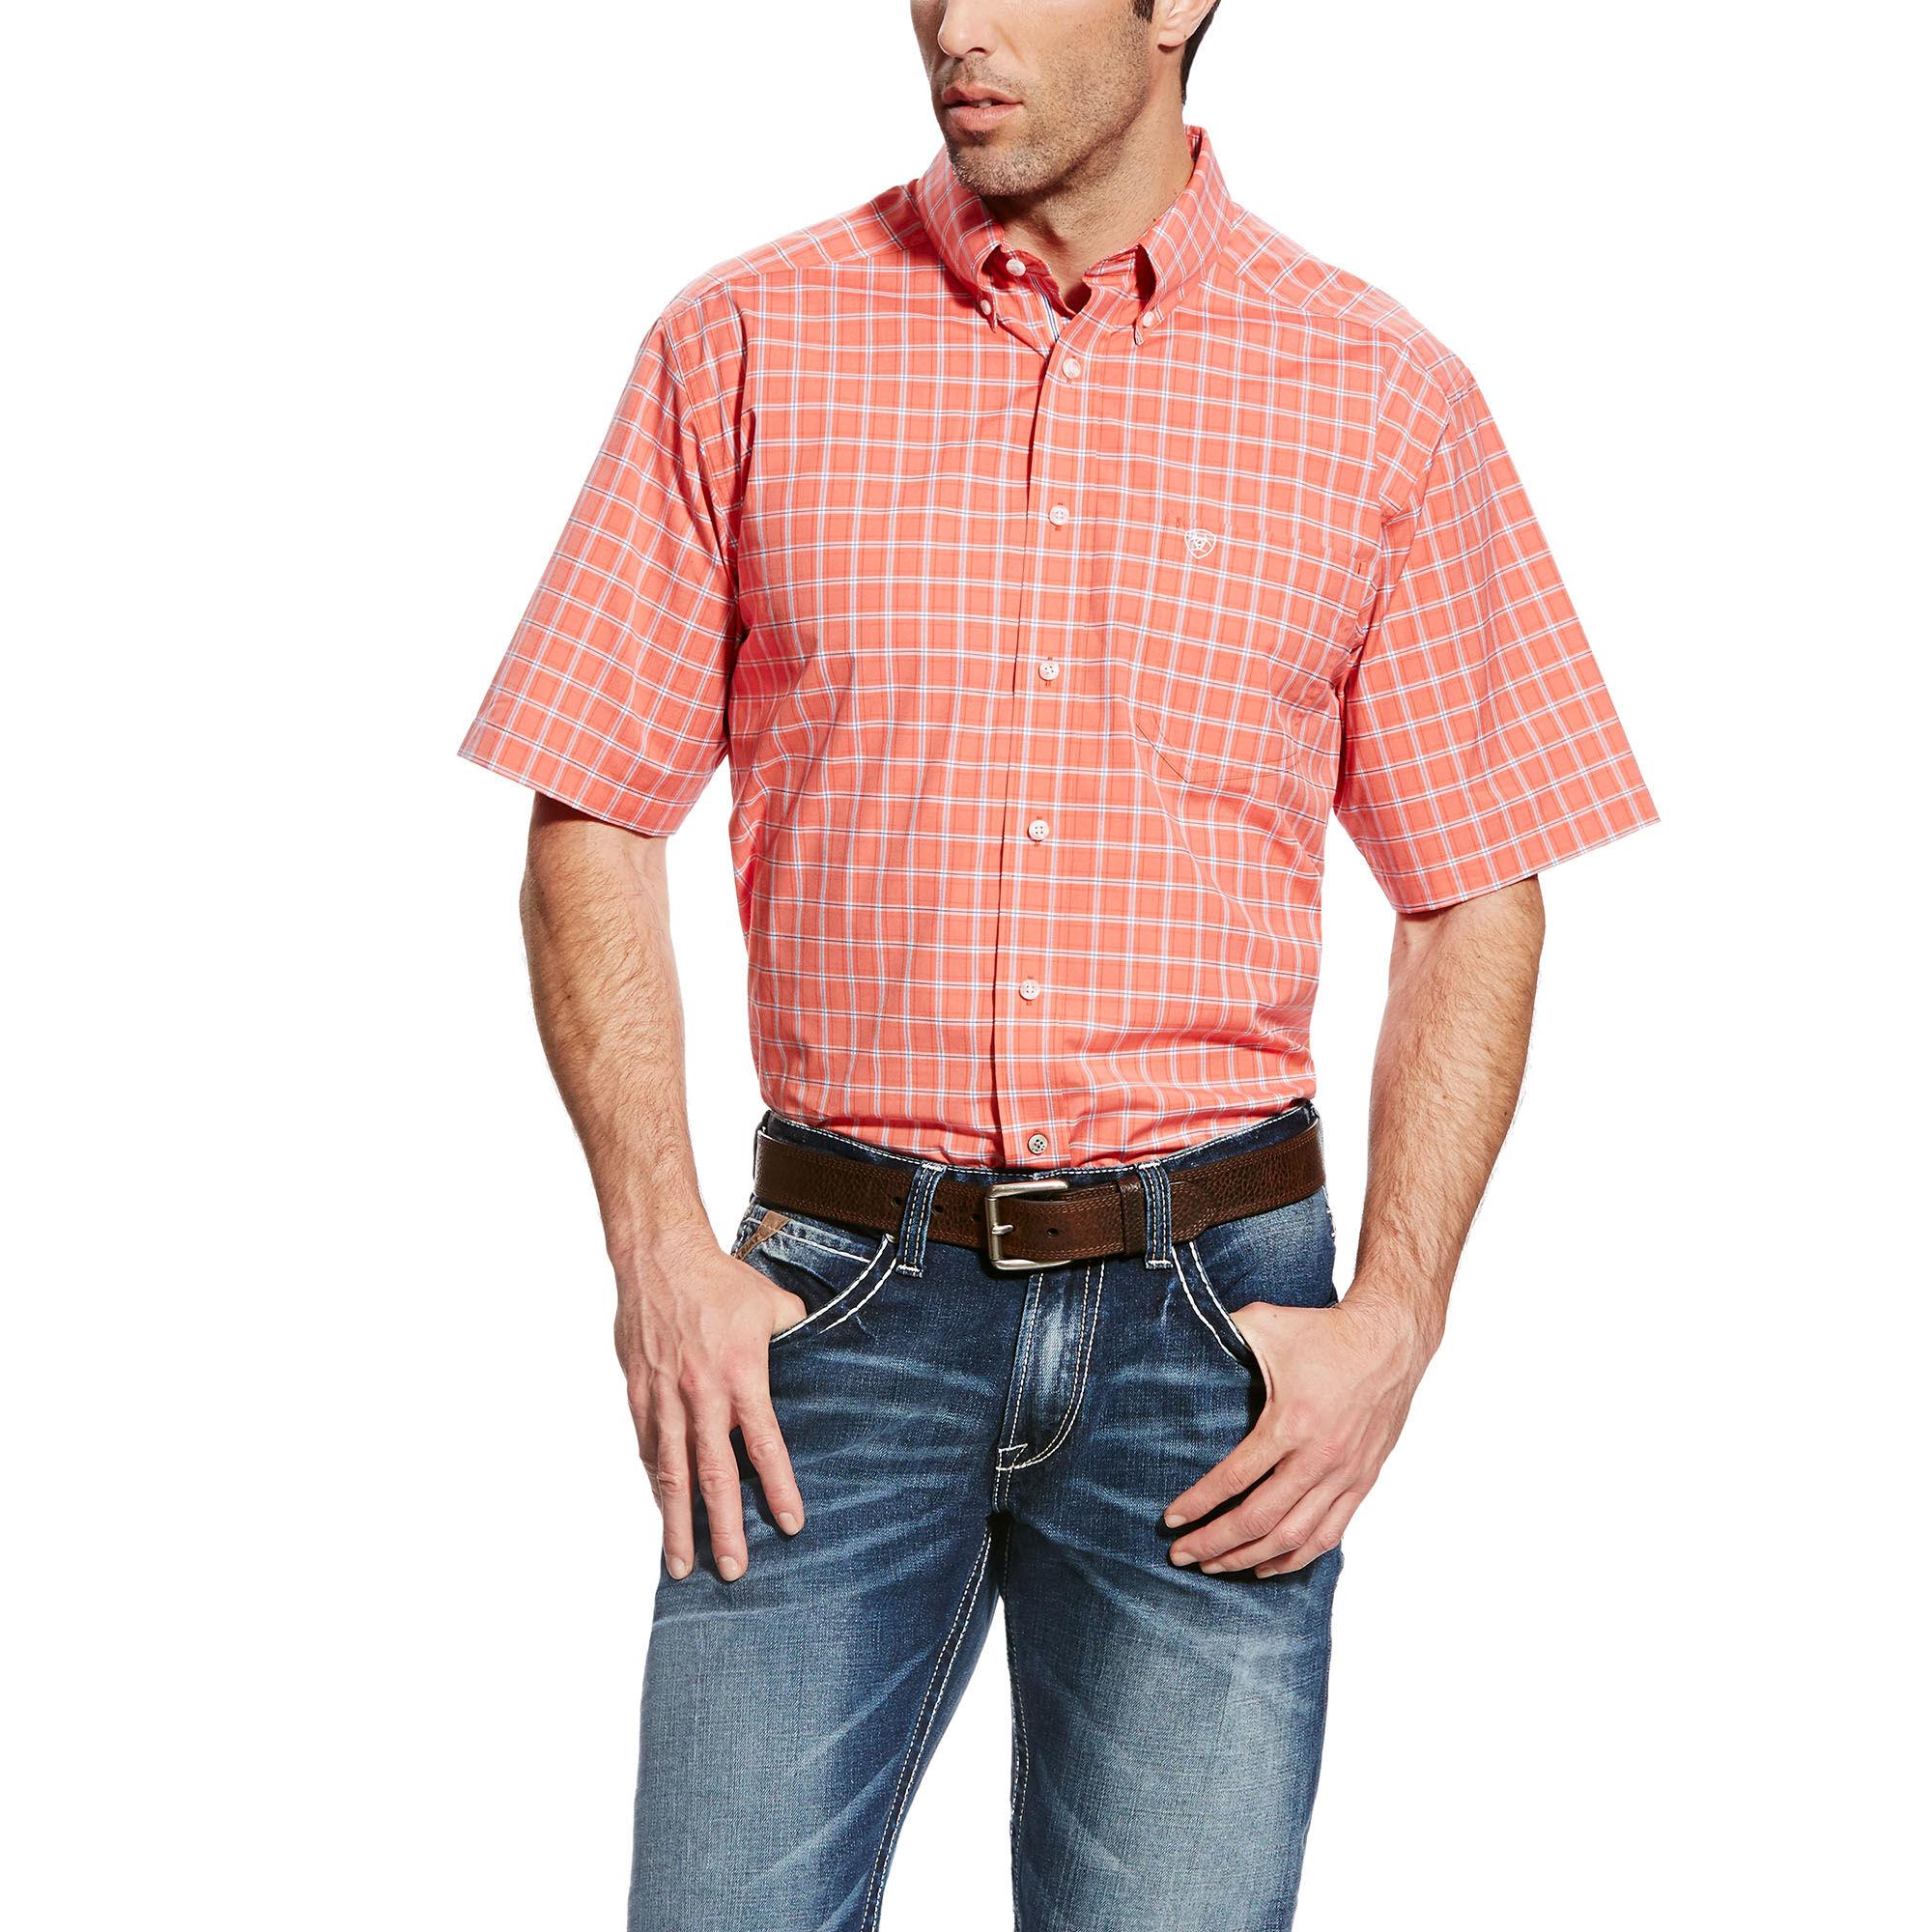 Pro Series Finch Shirt